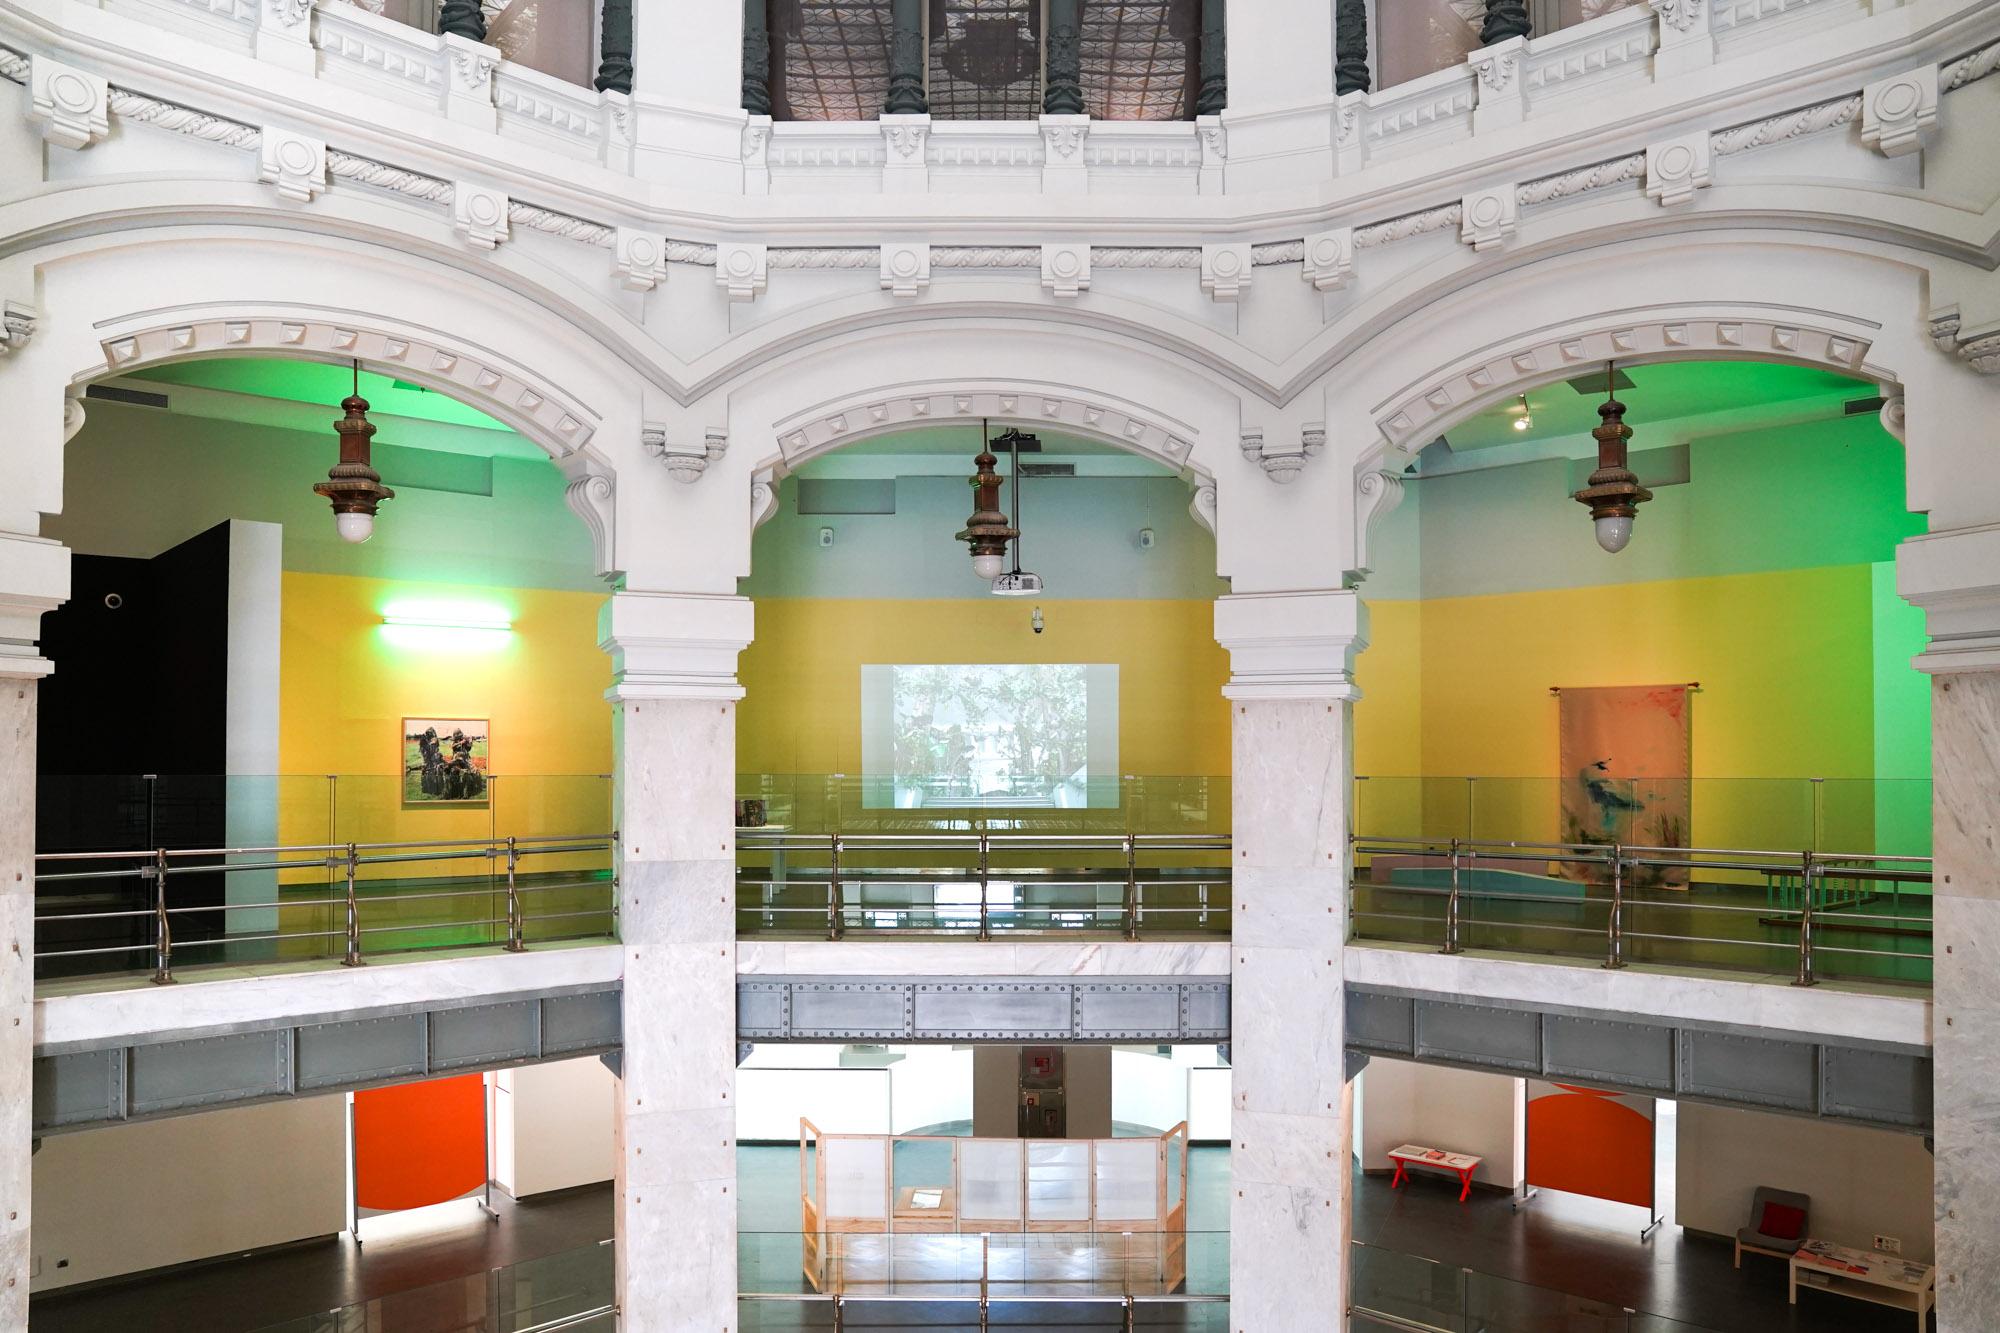 CaballeroCosmica-ExhibitionPhoto-CentroCentro-ElcalorDerriteLosEstilos-26.jpg